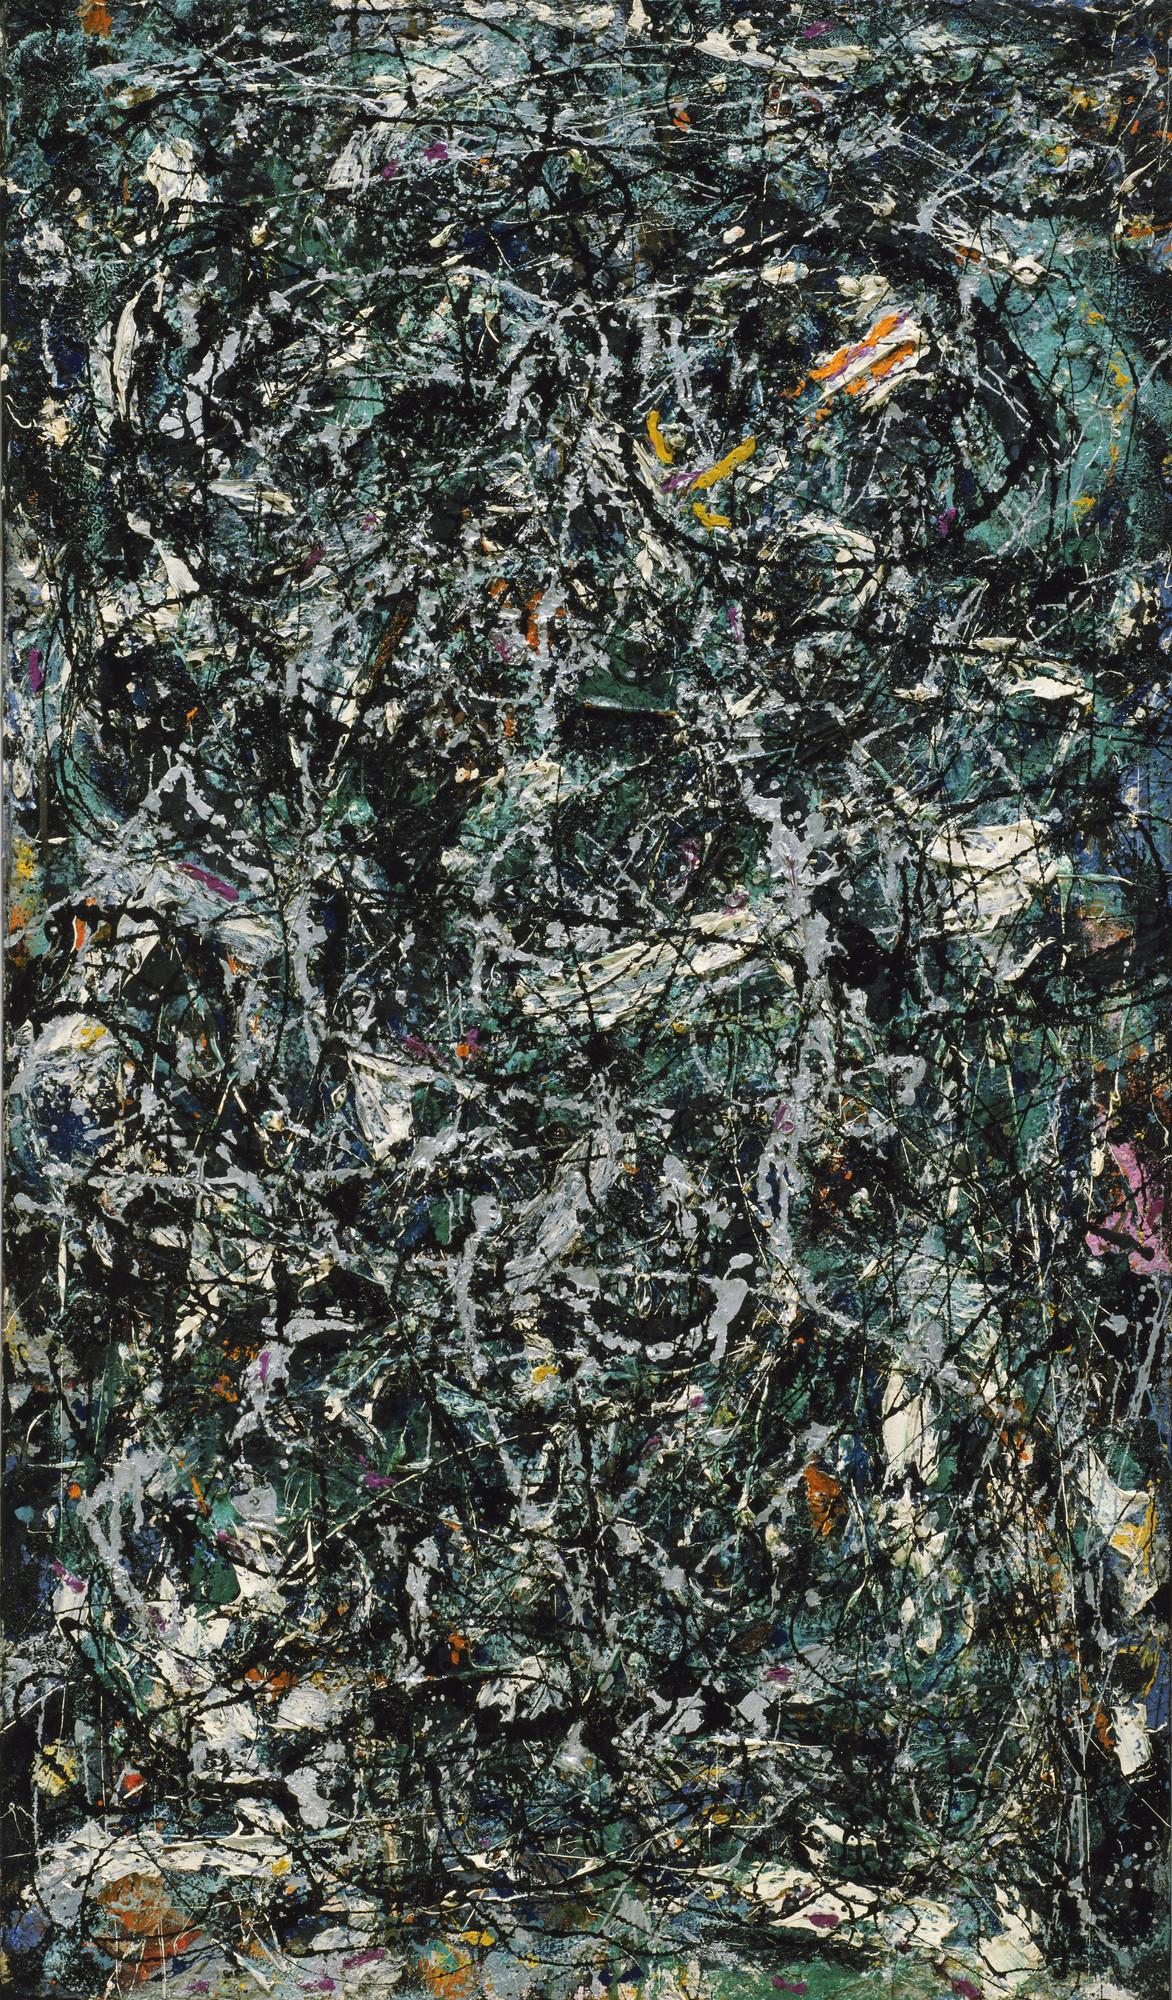 Jackson Pollock Full Fathom Five MoMA - How much is a fathom